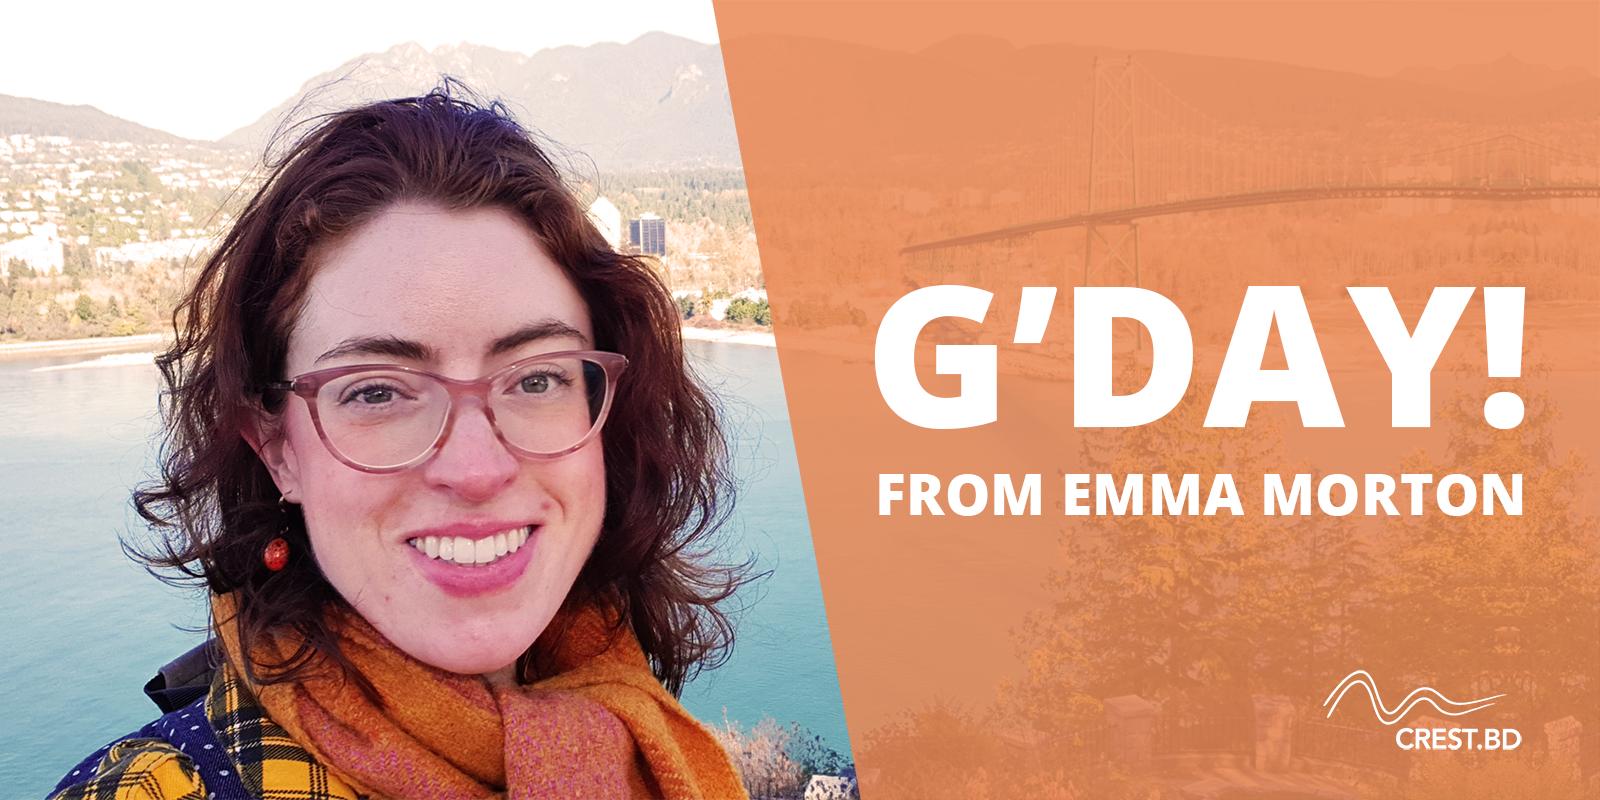 G'day! (An Australian hello from Emma)